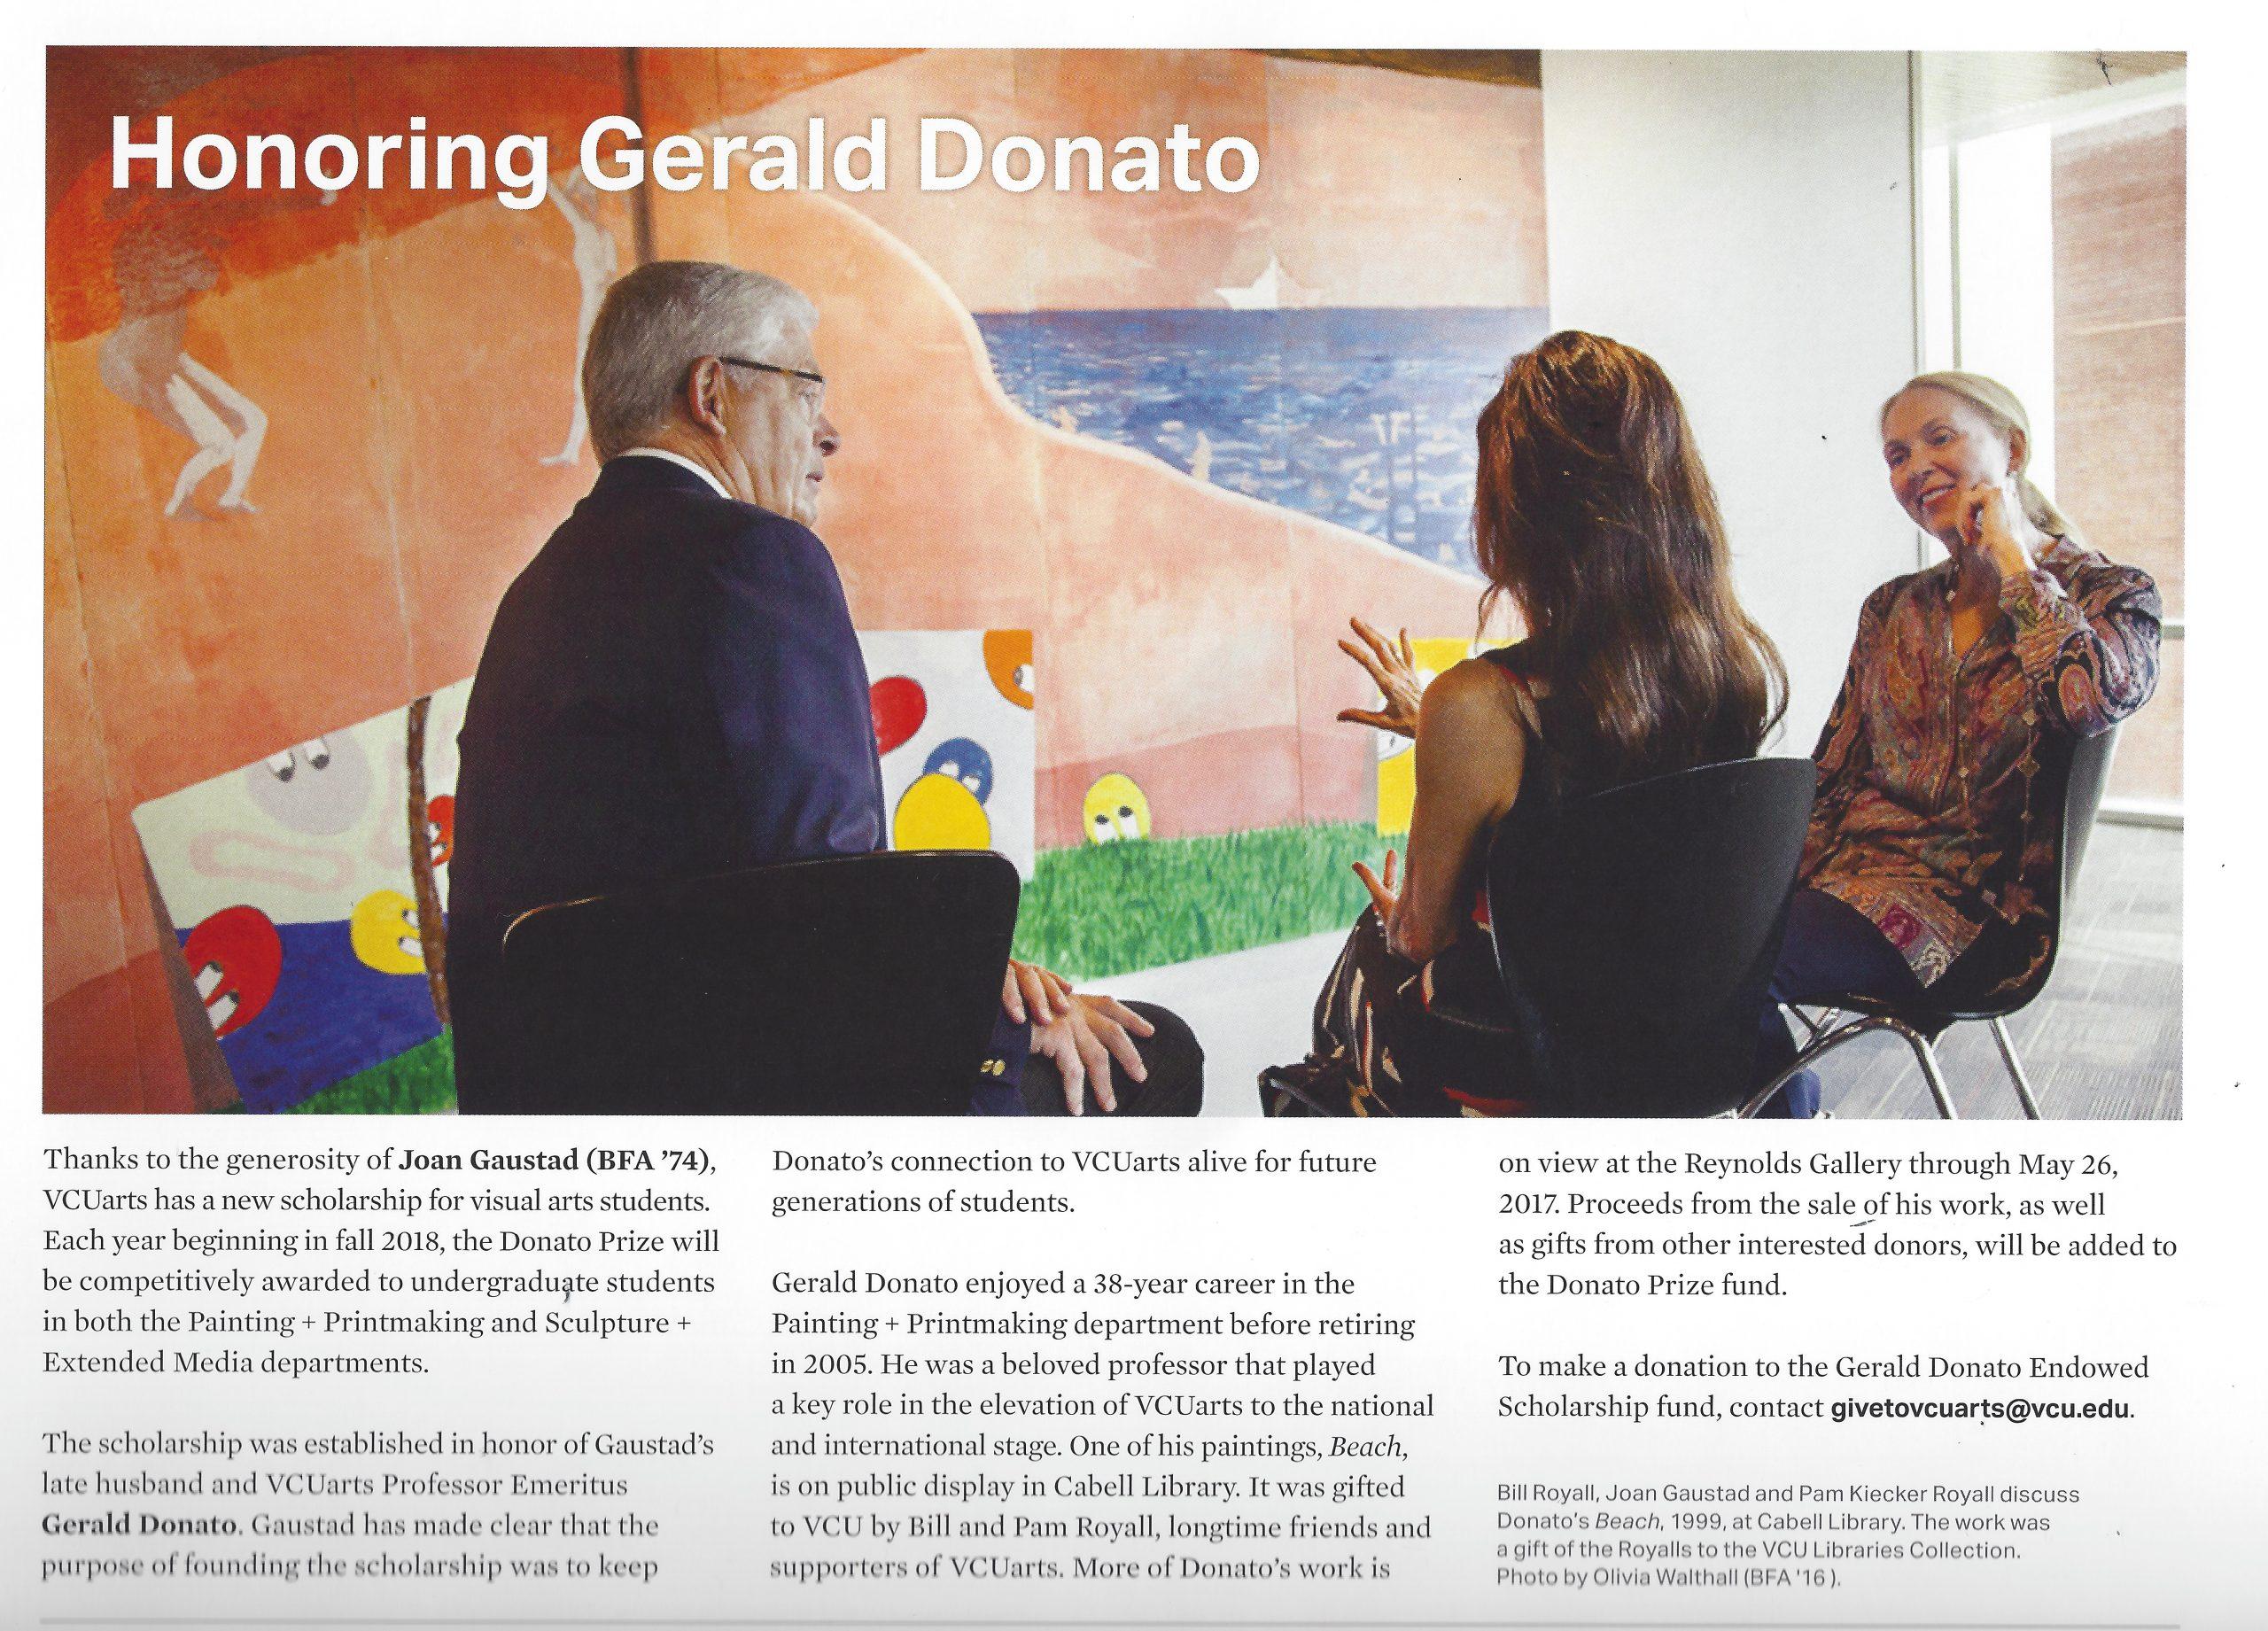 Gerald Donato Scholarship Fund